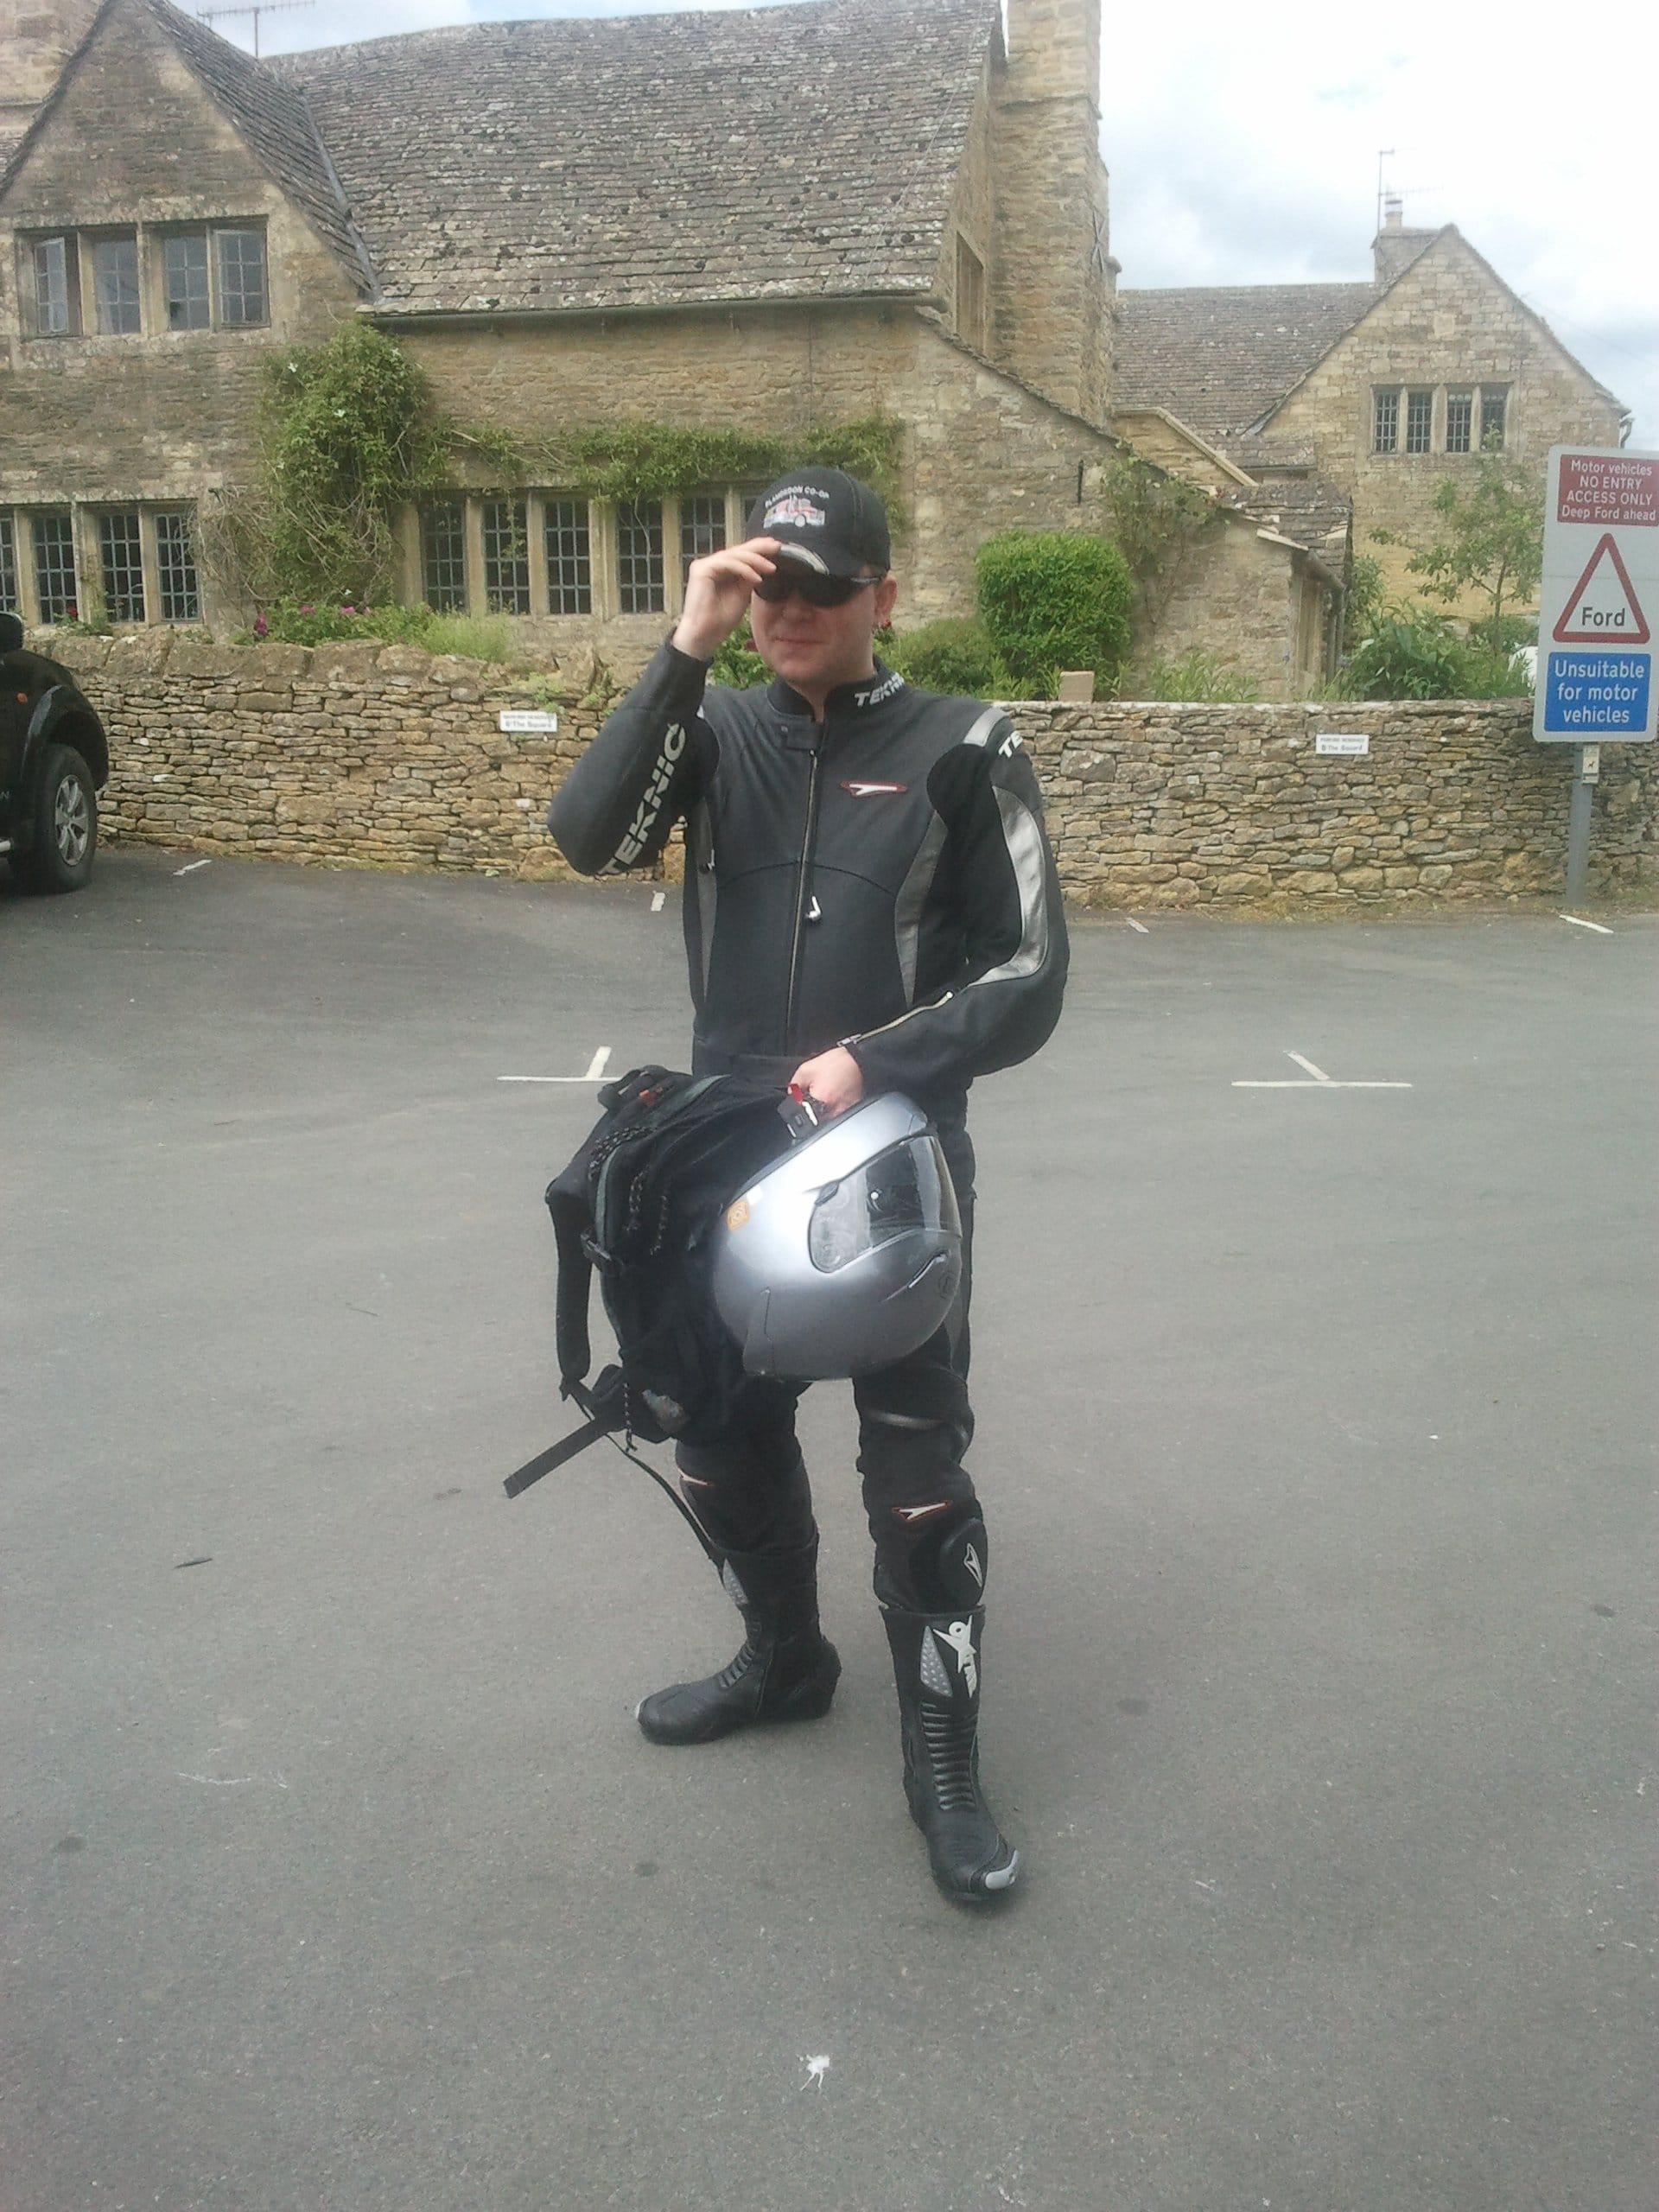 Iain Riddell holding his motor cycle helmet